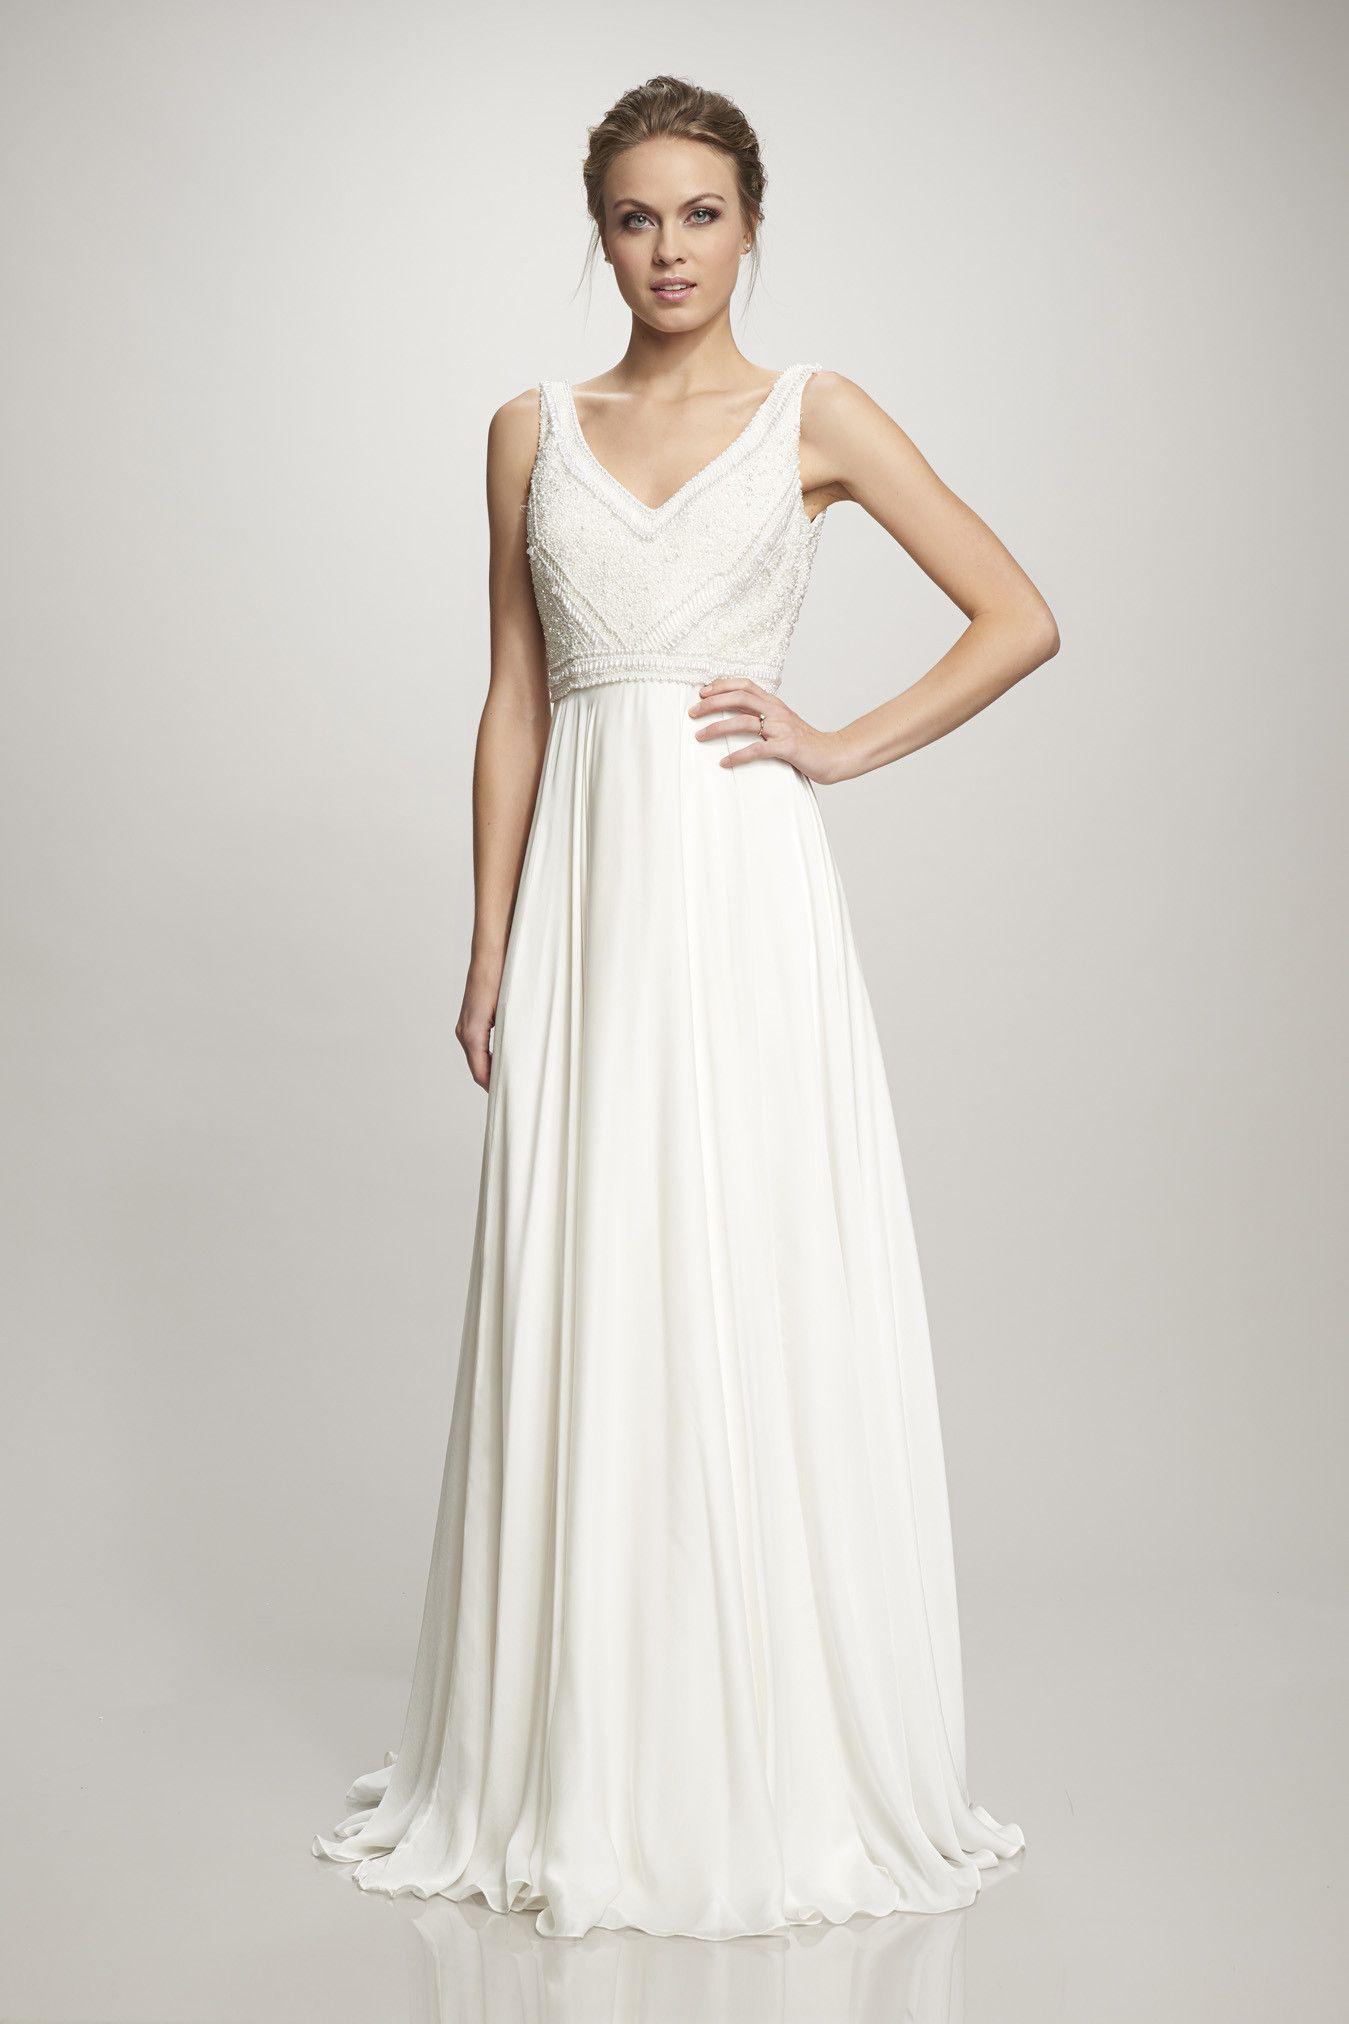 f49b6b963f02 look book fashion photographer Theia Bridal, Bridal Gowns, Bridal Style,  Sell Wedding Dress